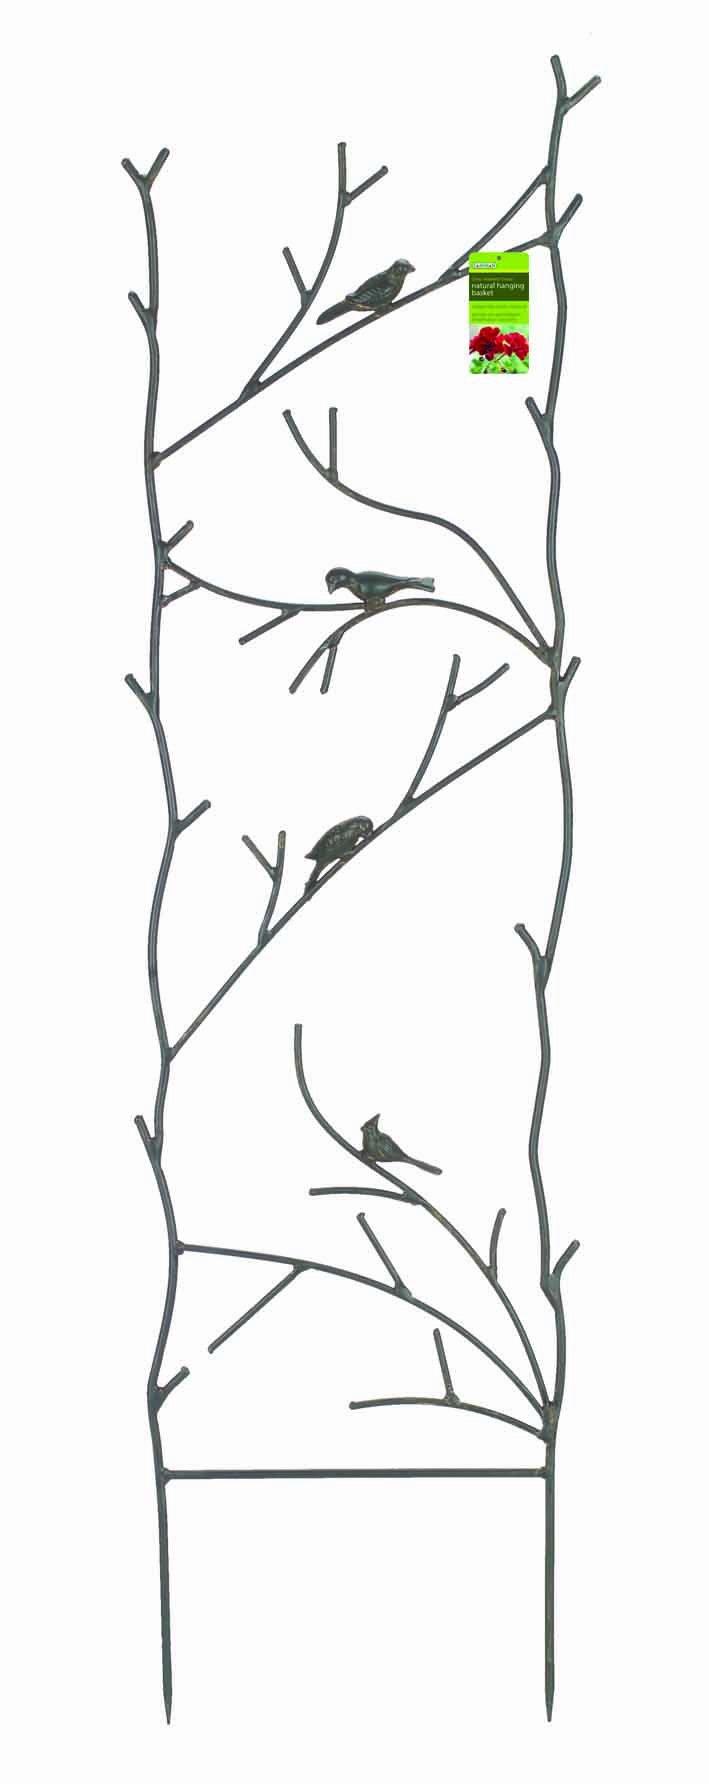 Gardman R542 Bird and Branch Metal Trellis, 14.68'' Wide x 51'' High